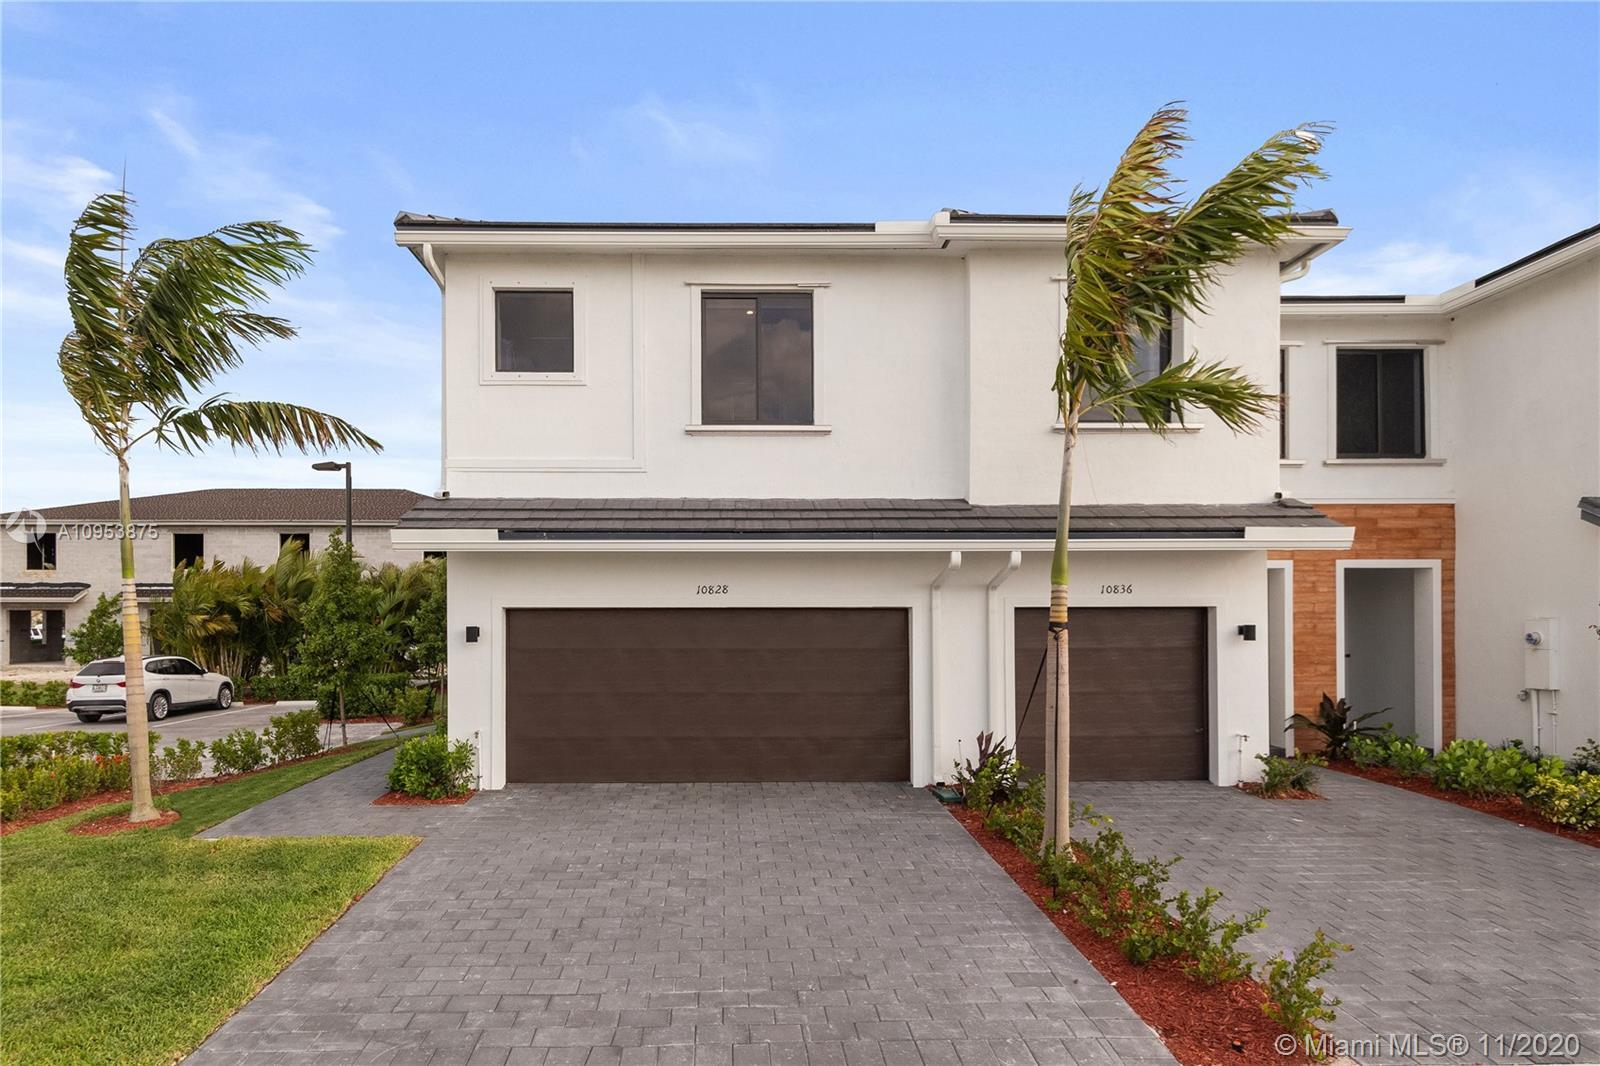 10974 Sw 235th St Property Photo 1